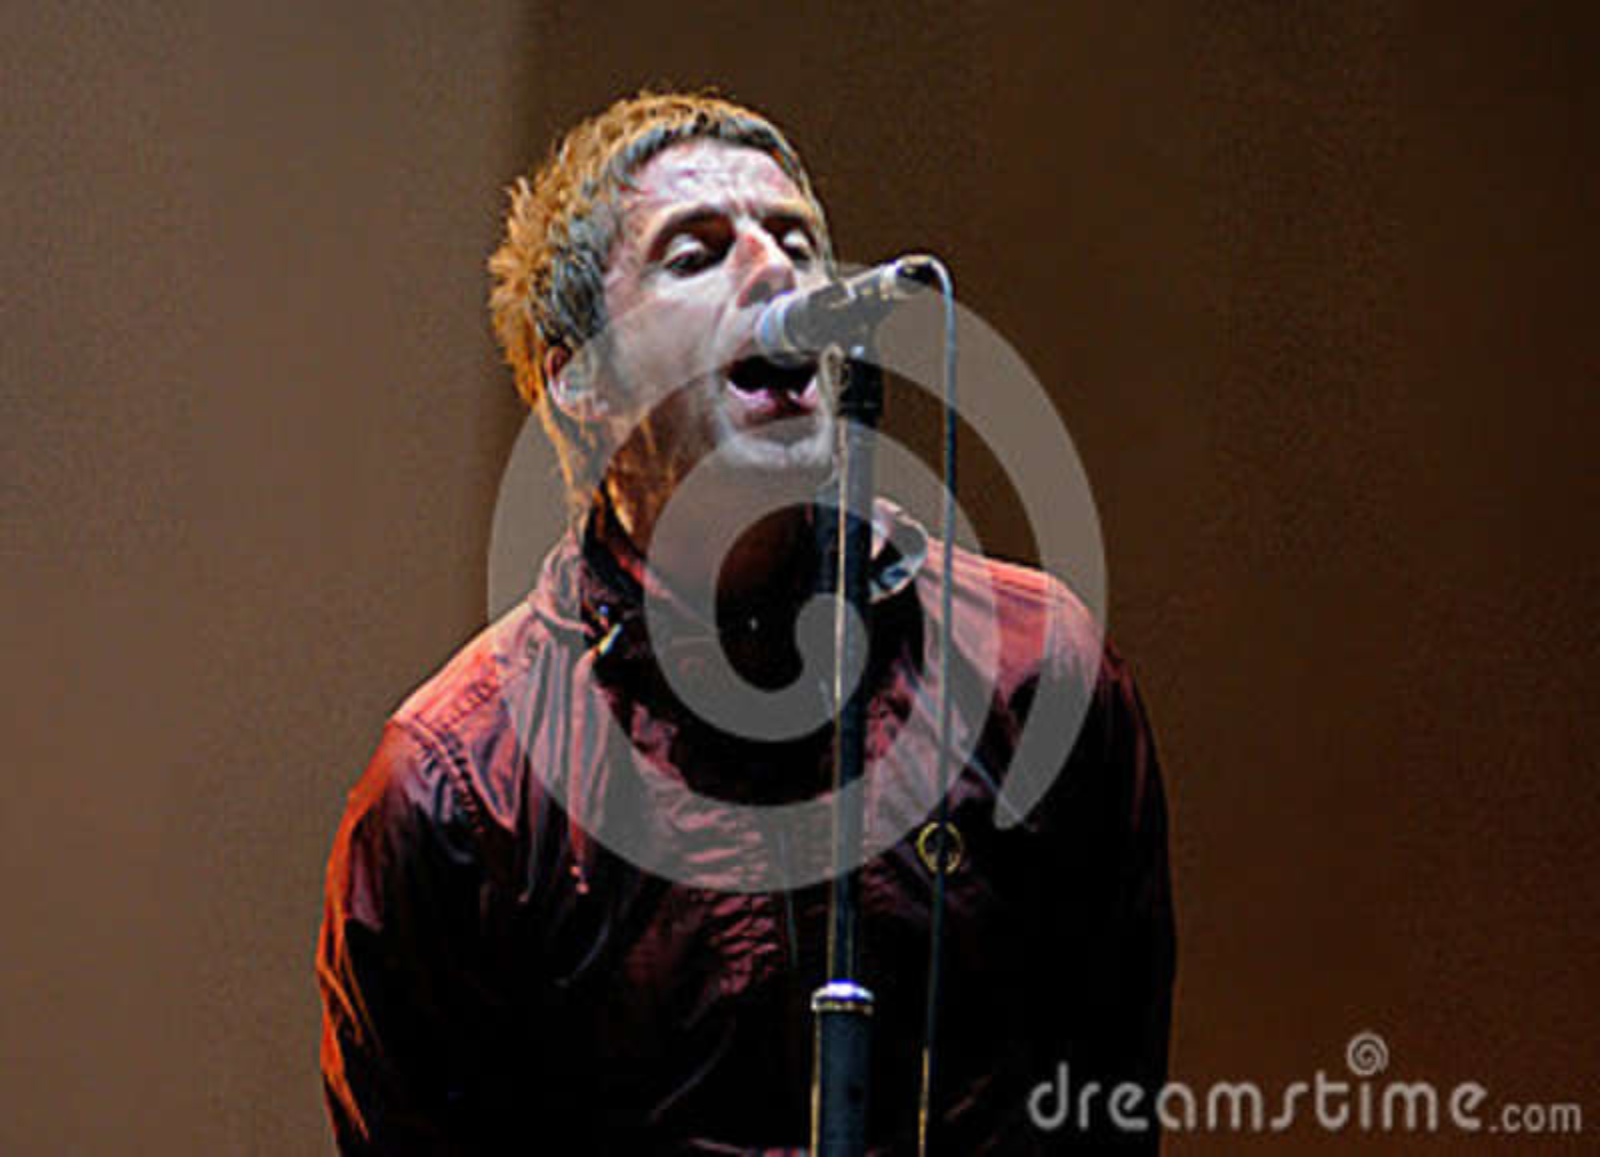 Beady Eye band concert performance at FIB (Festival Internacional de Benicassim) 2013 Festival